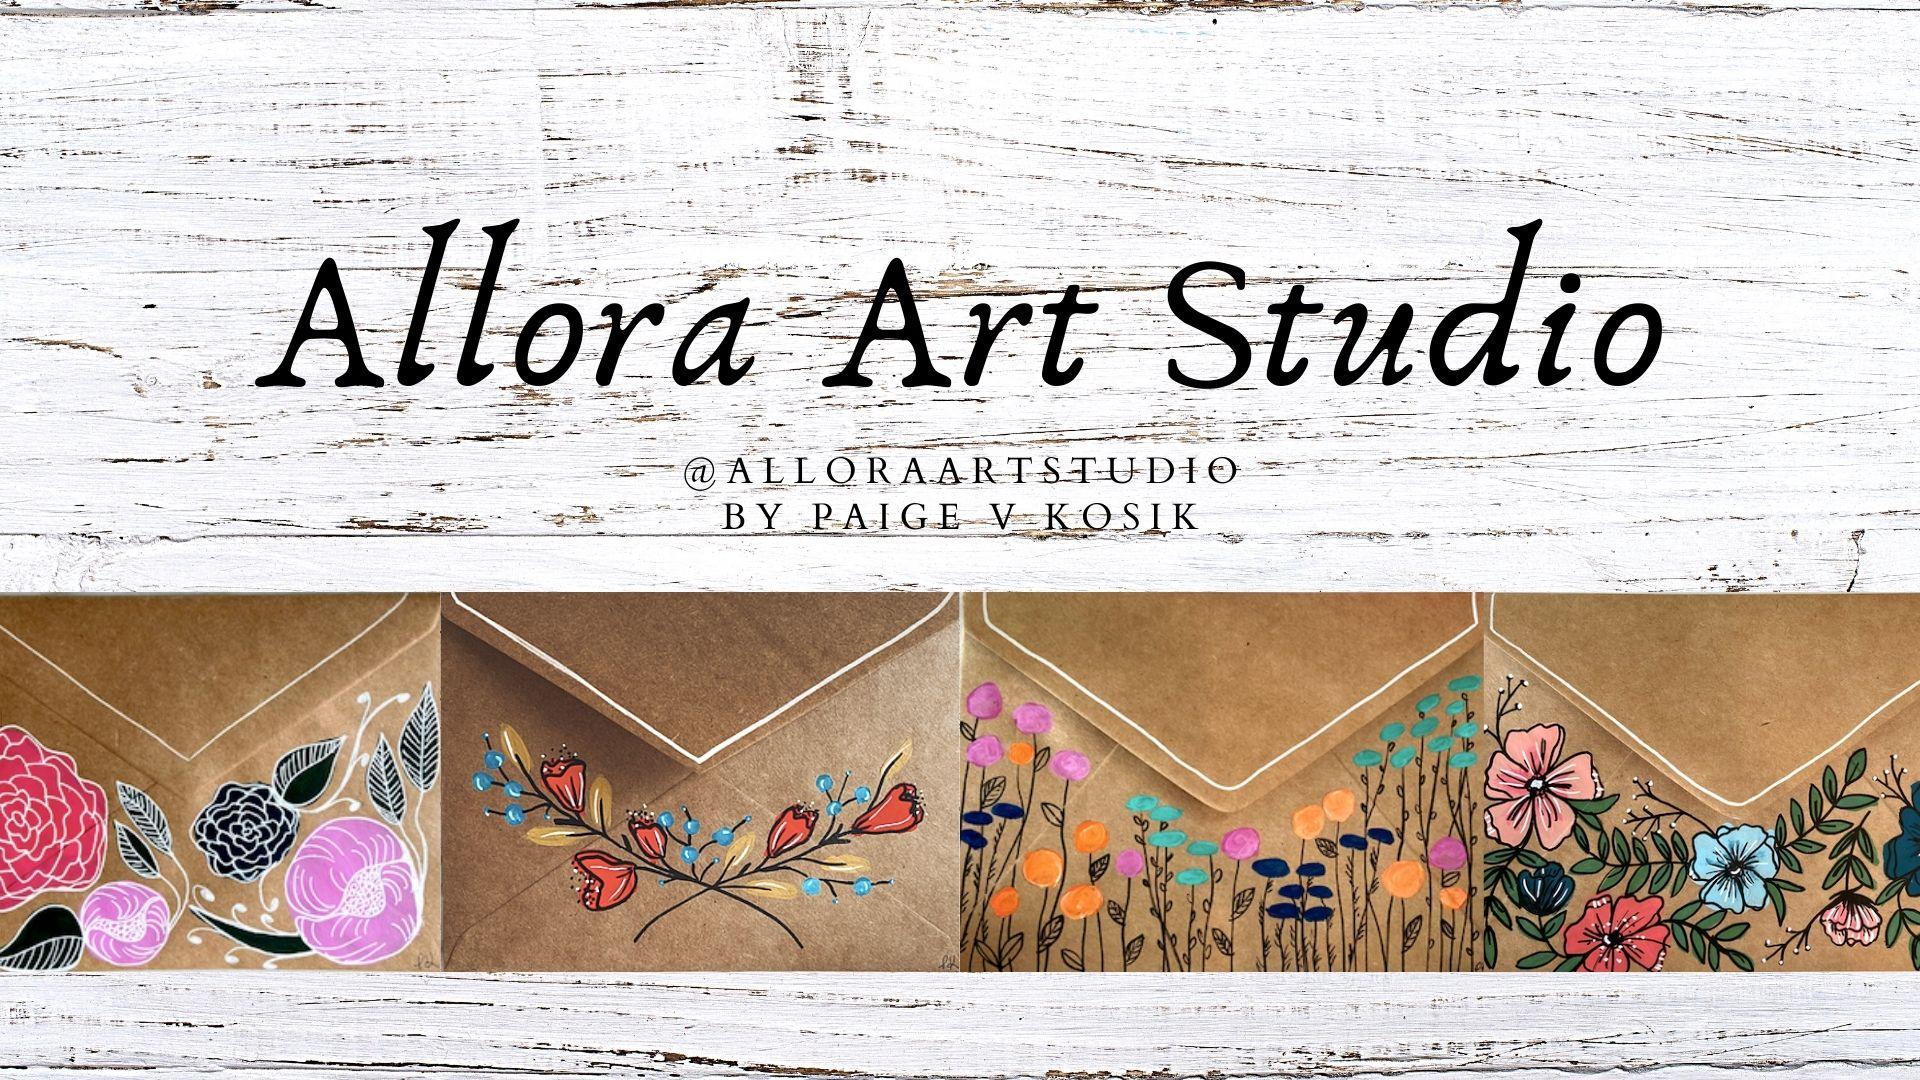 Allora Art Studio